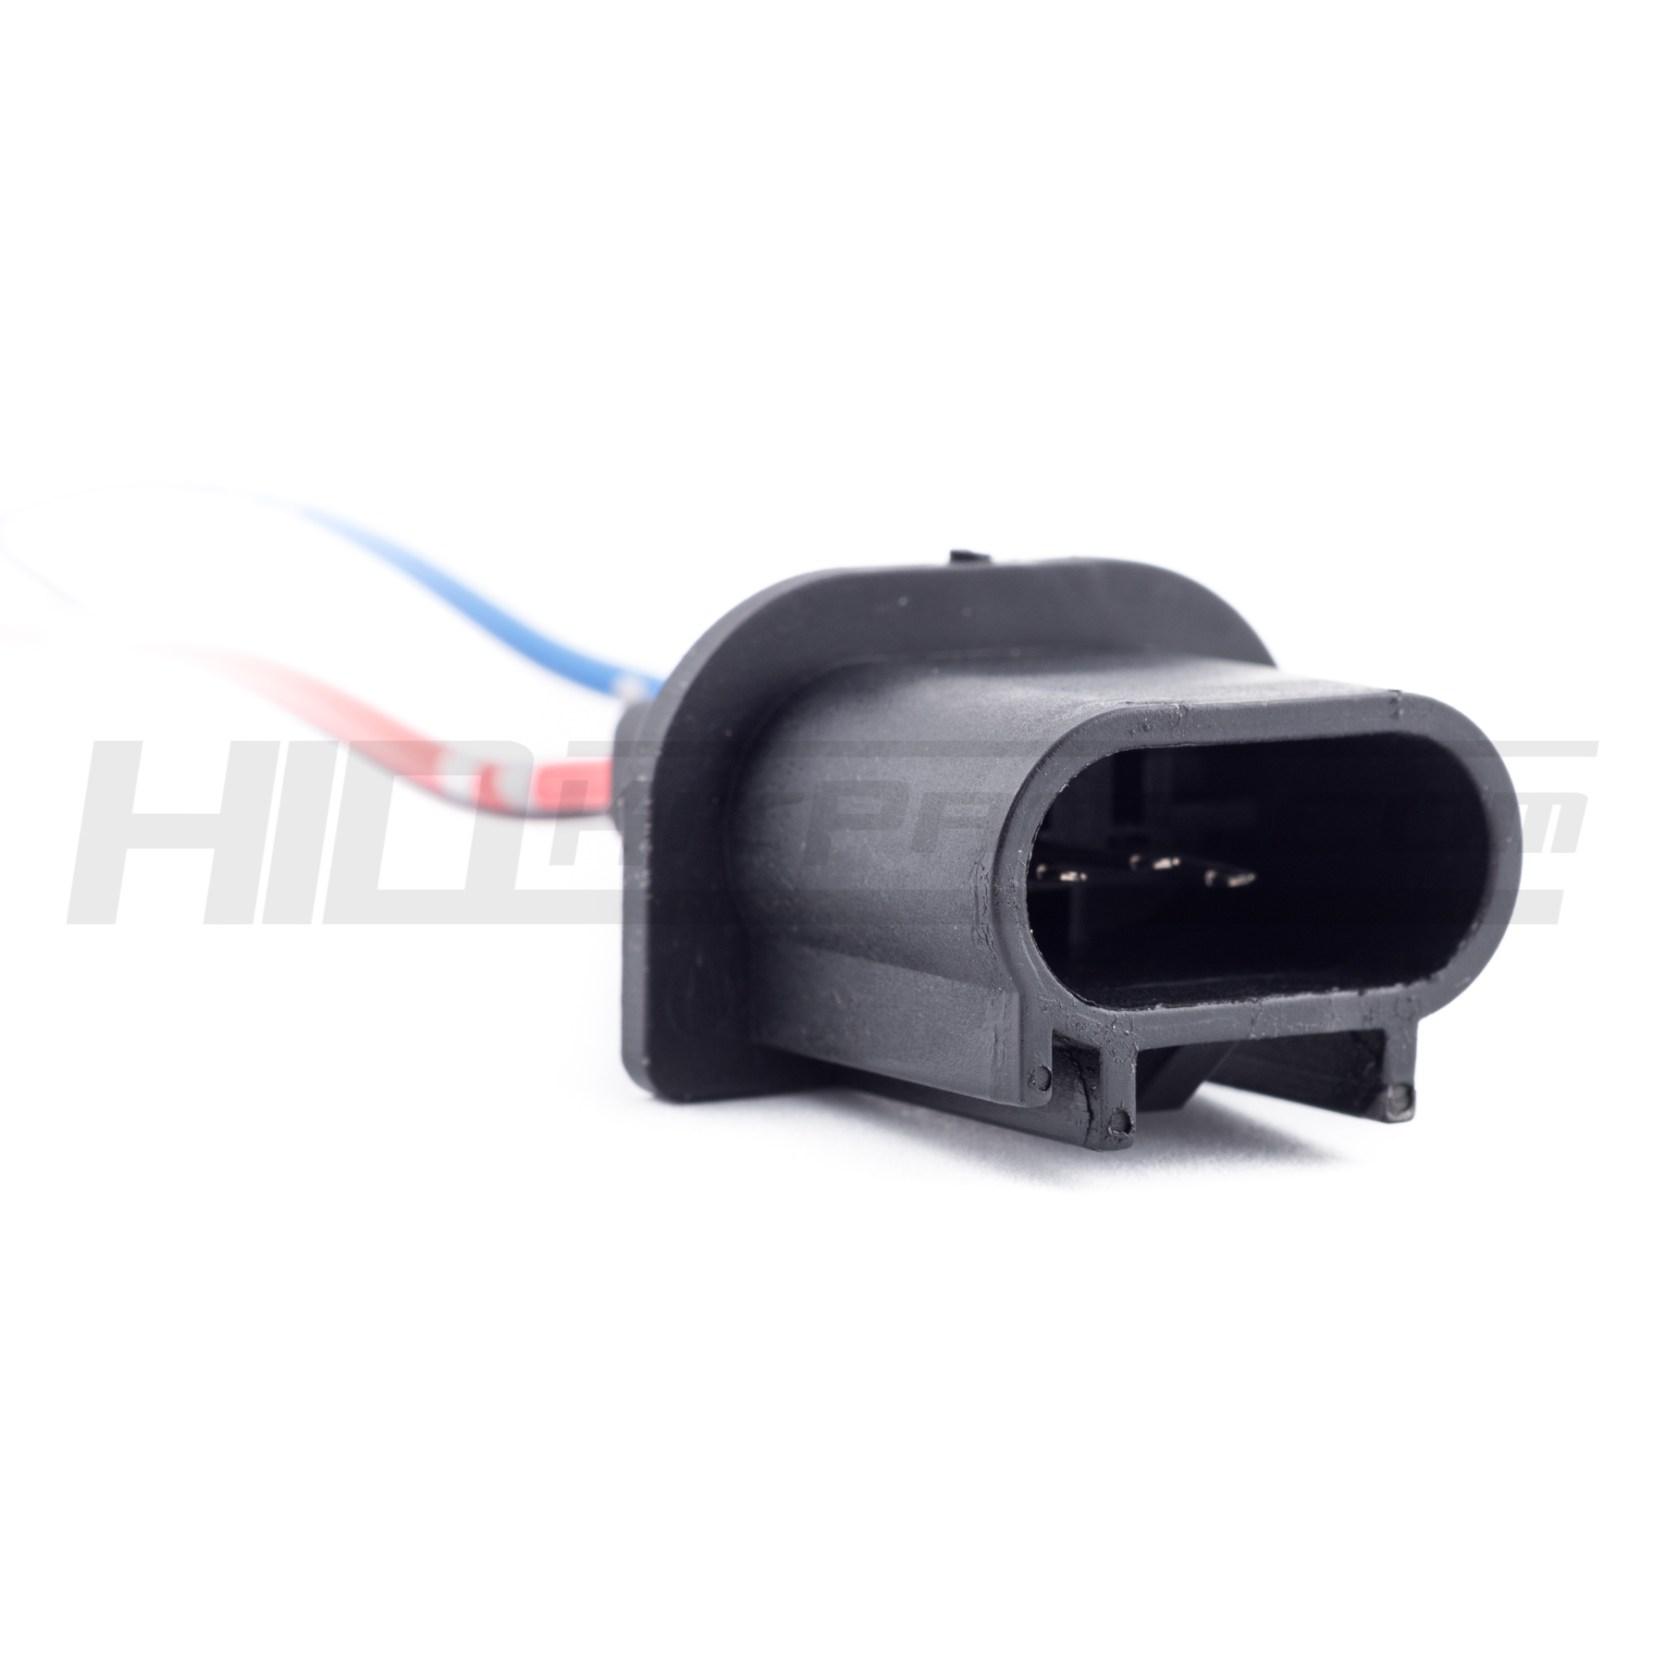 9008 Bulb Wiring Schematic. Xtravision Headlight Bulb, 893 ... H Headlight Wiring Schematic on